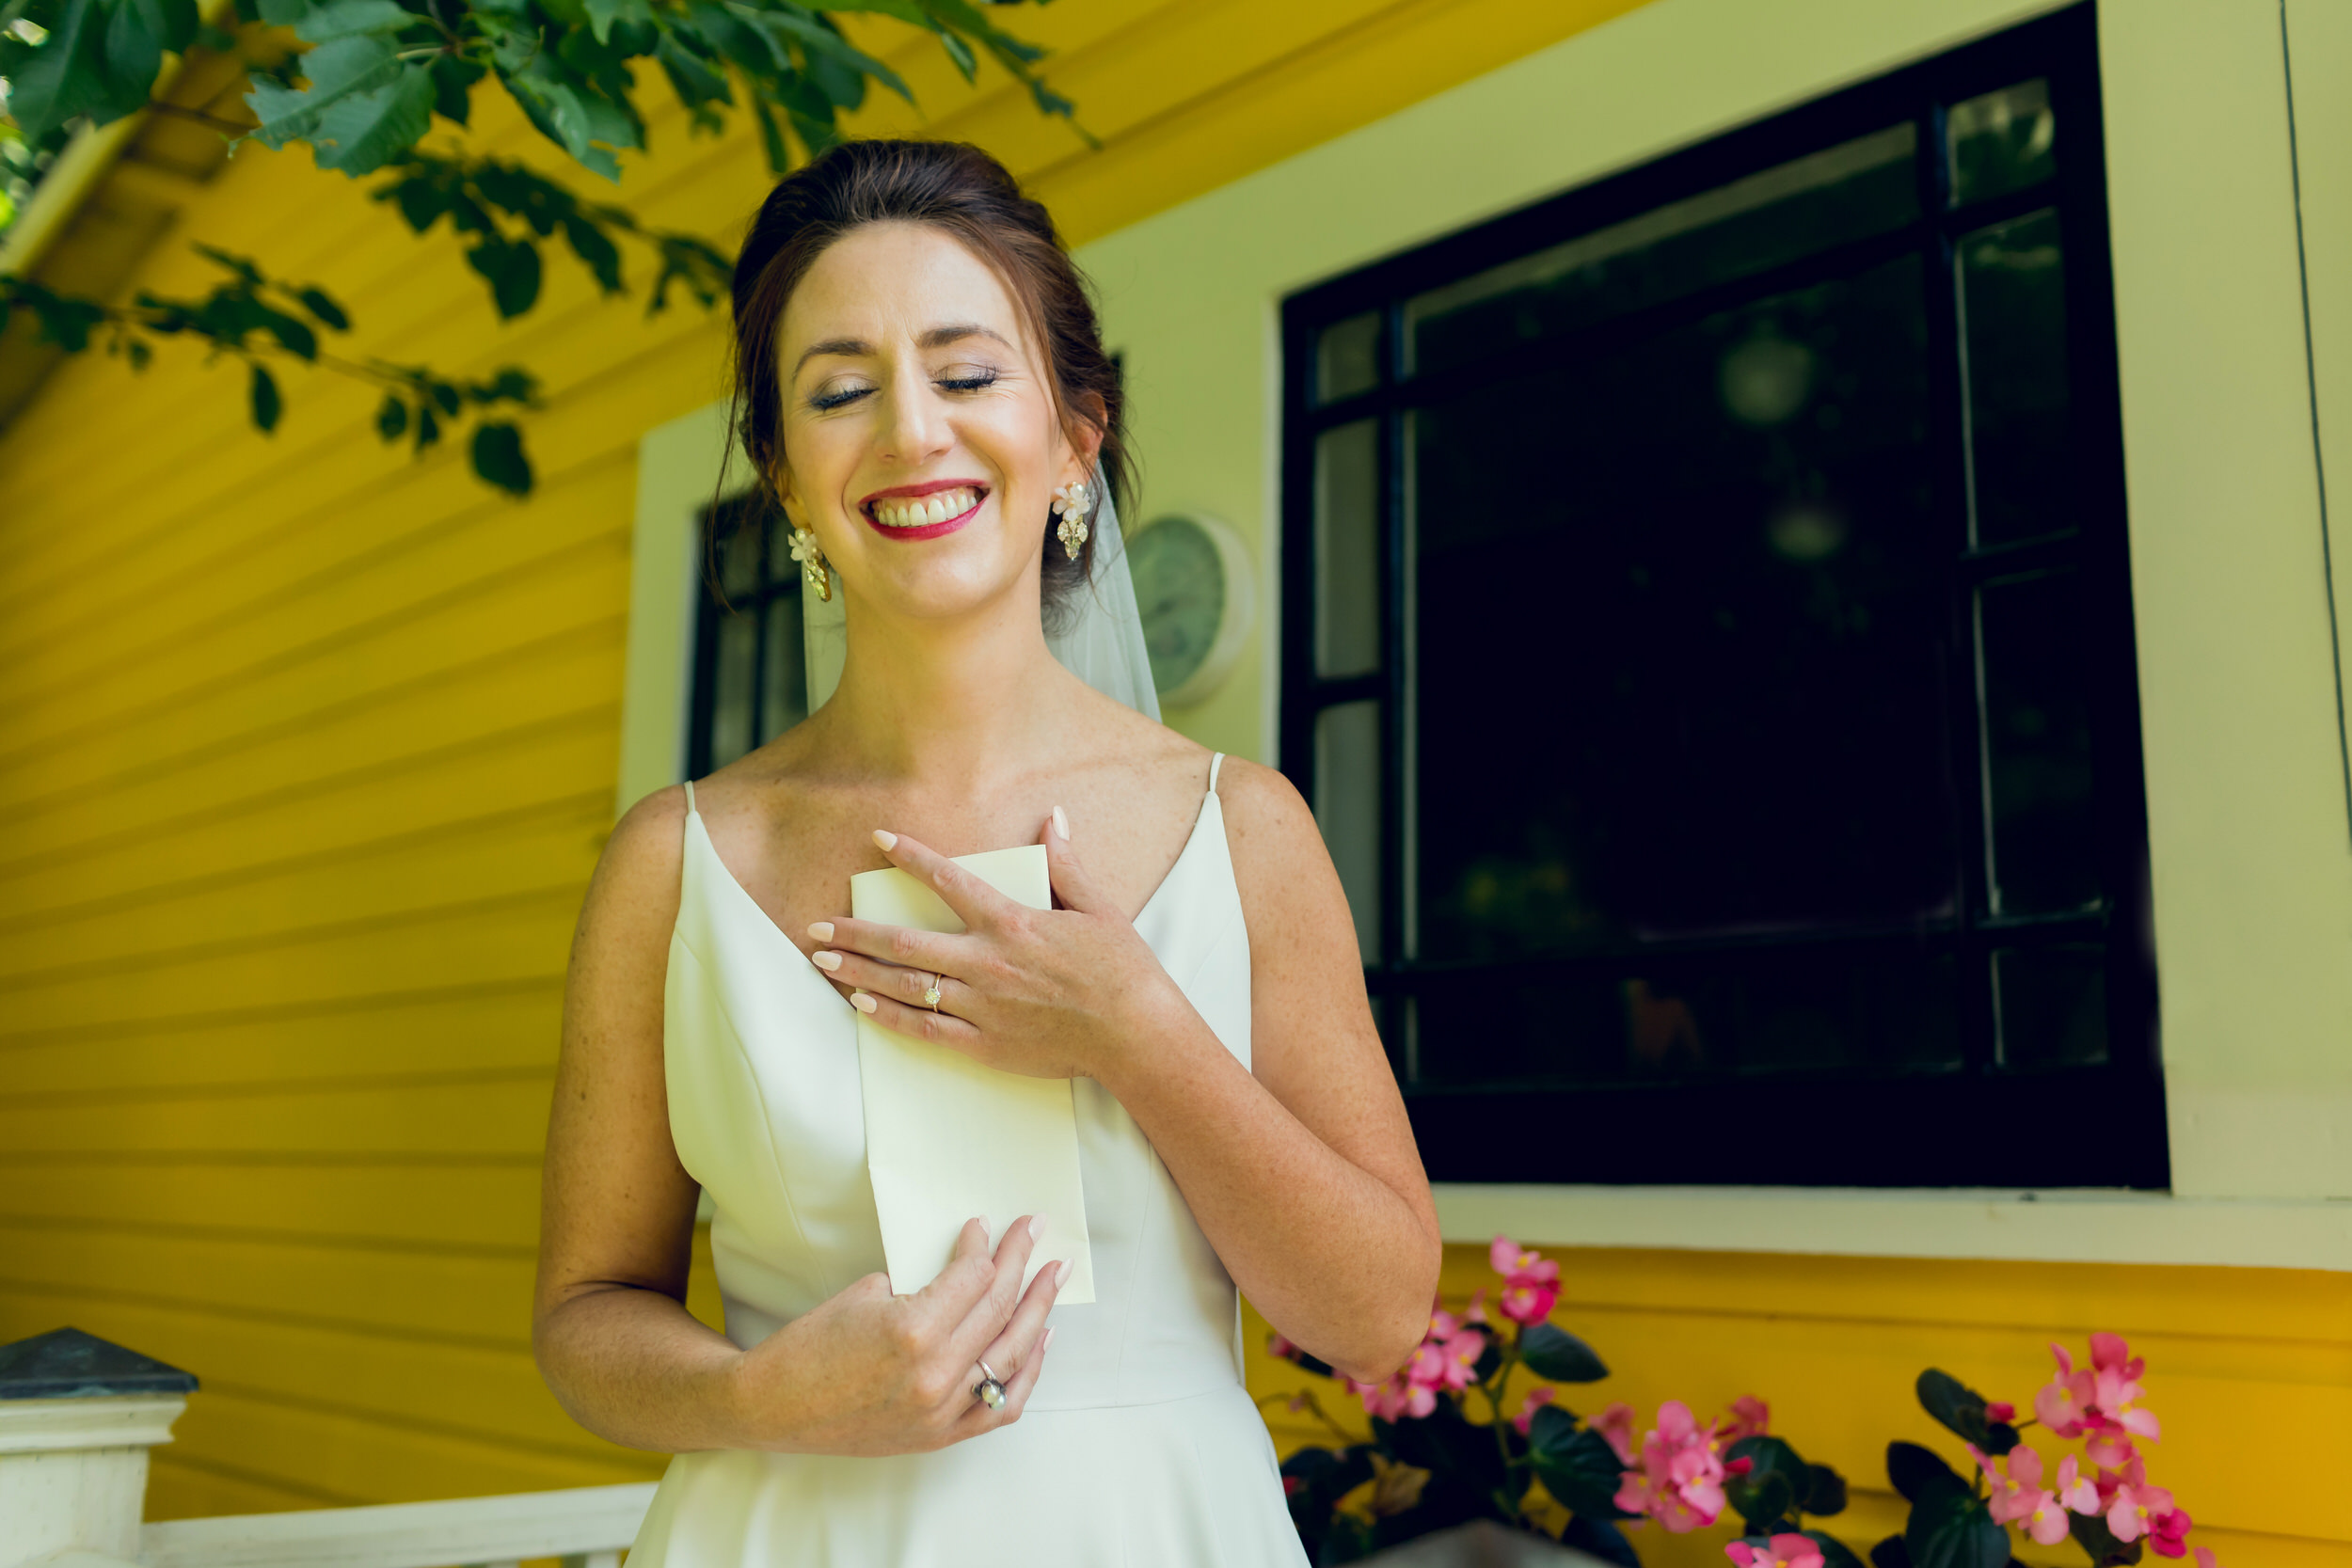 mthoodorganicfarms_wedding_BK058_starkphotography